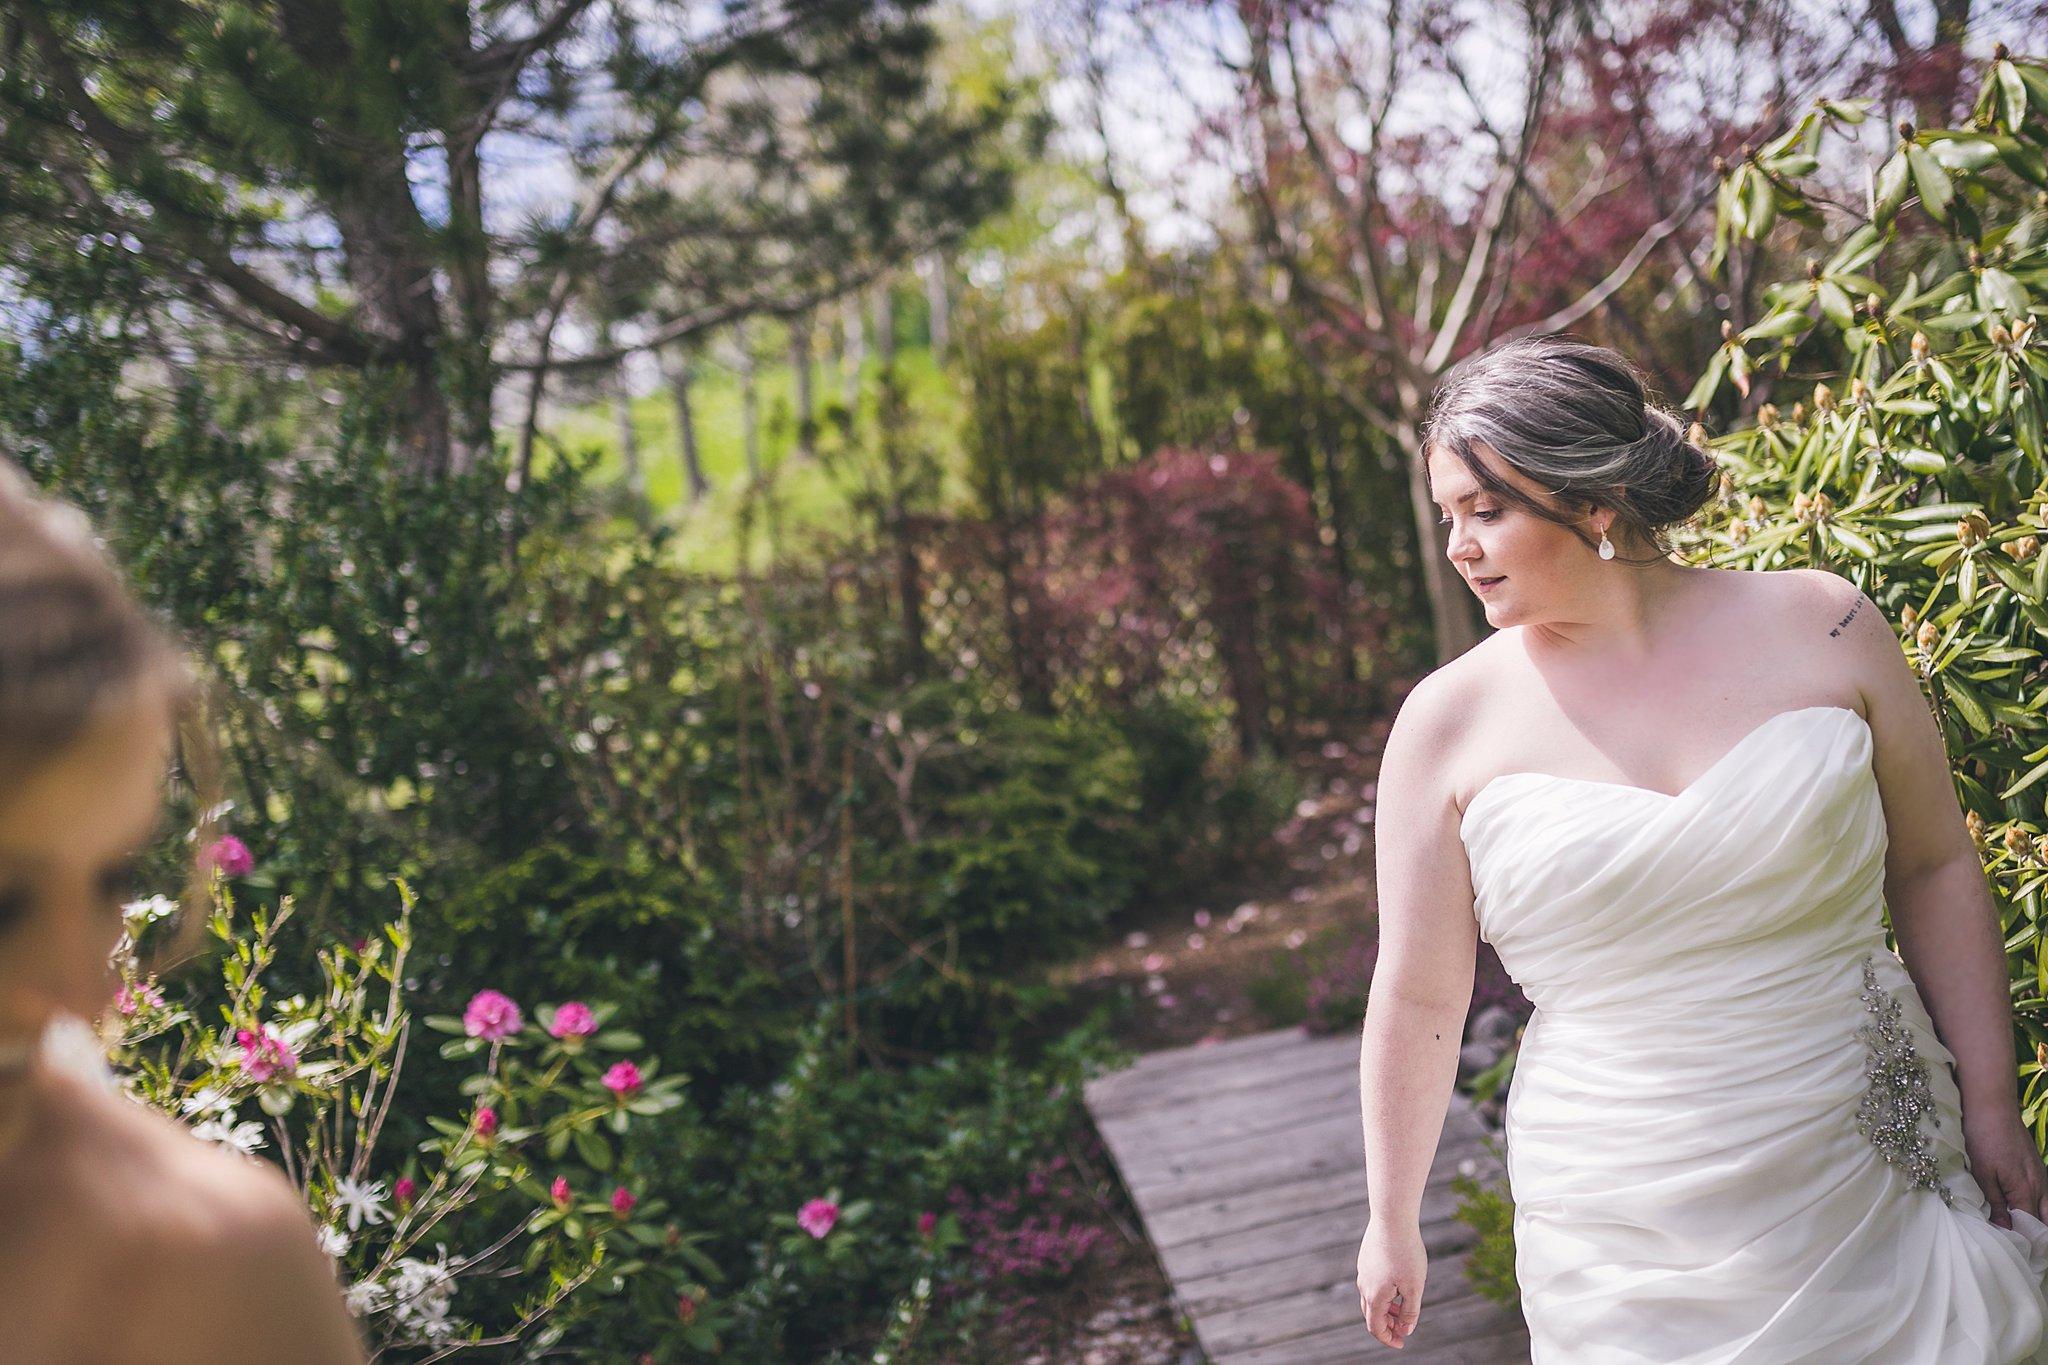 Backyard wedding portraits with a couple in St. John's, Newfoundland